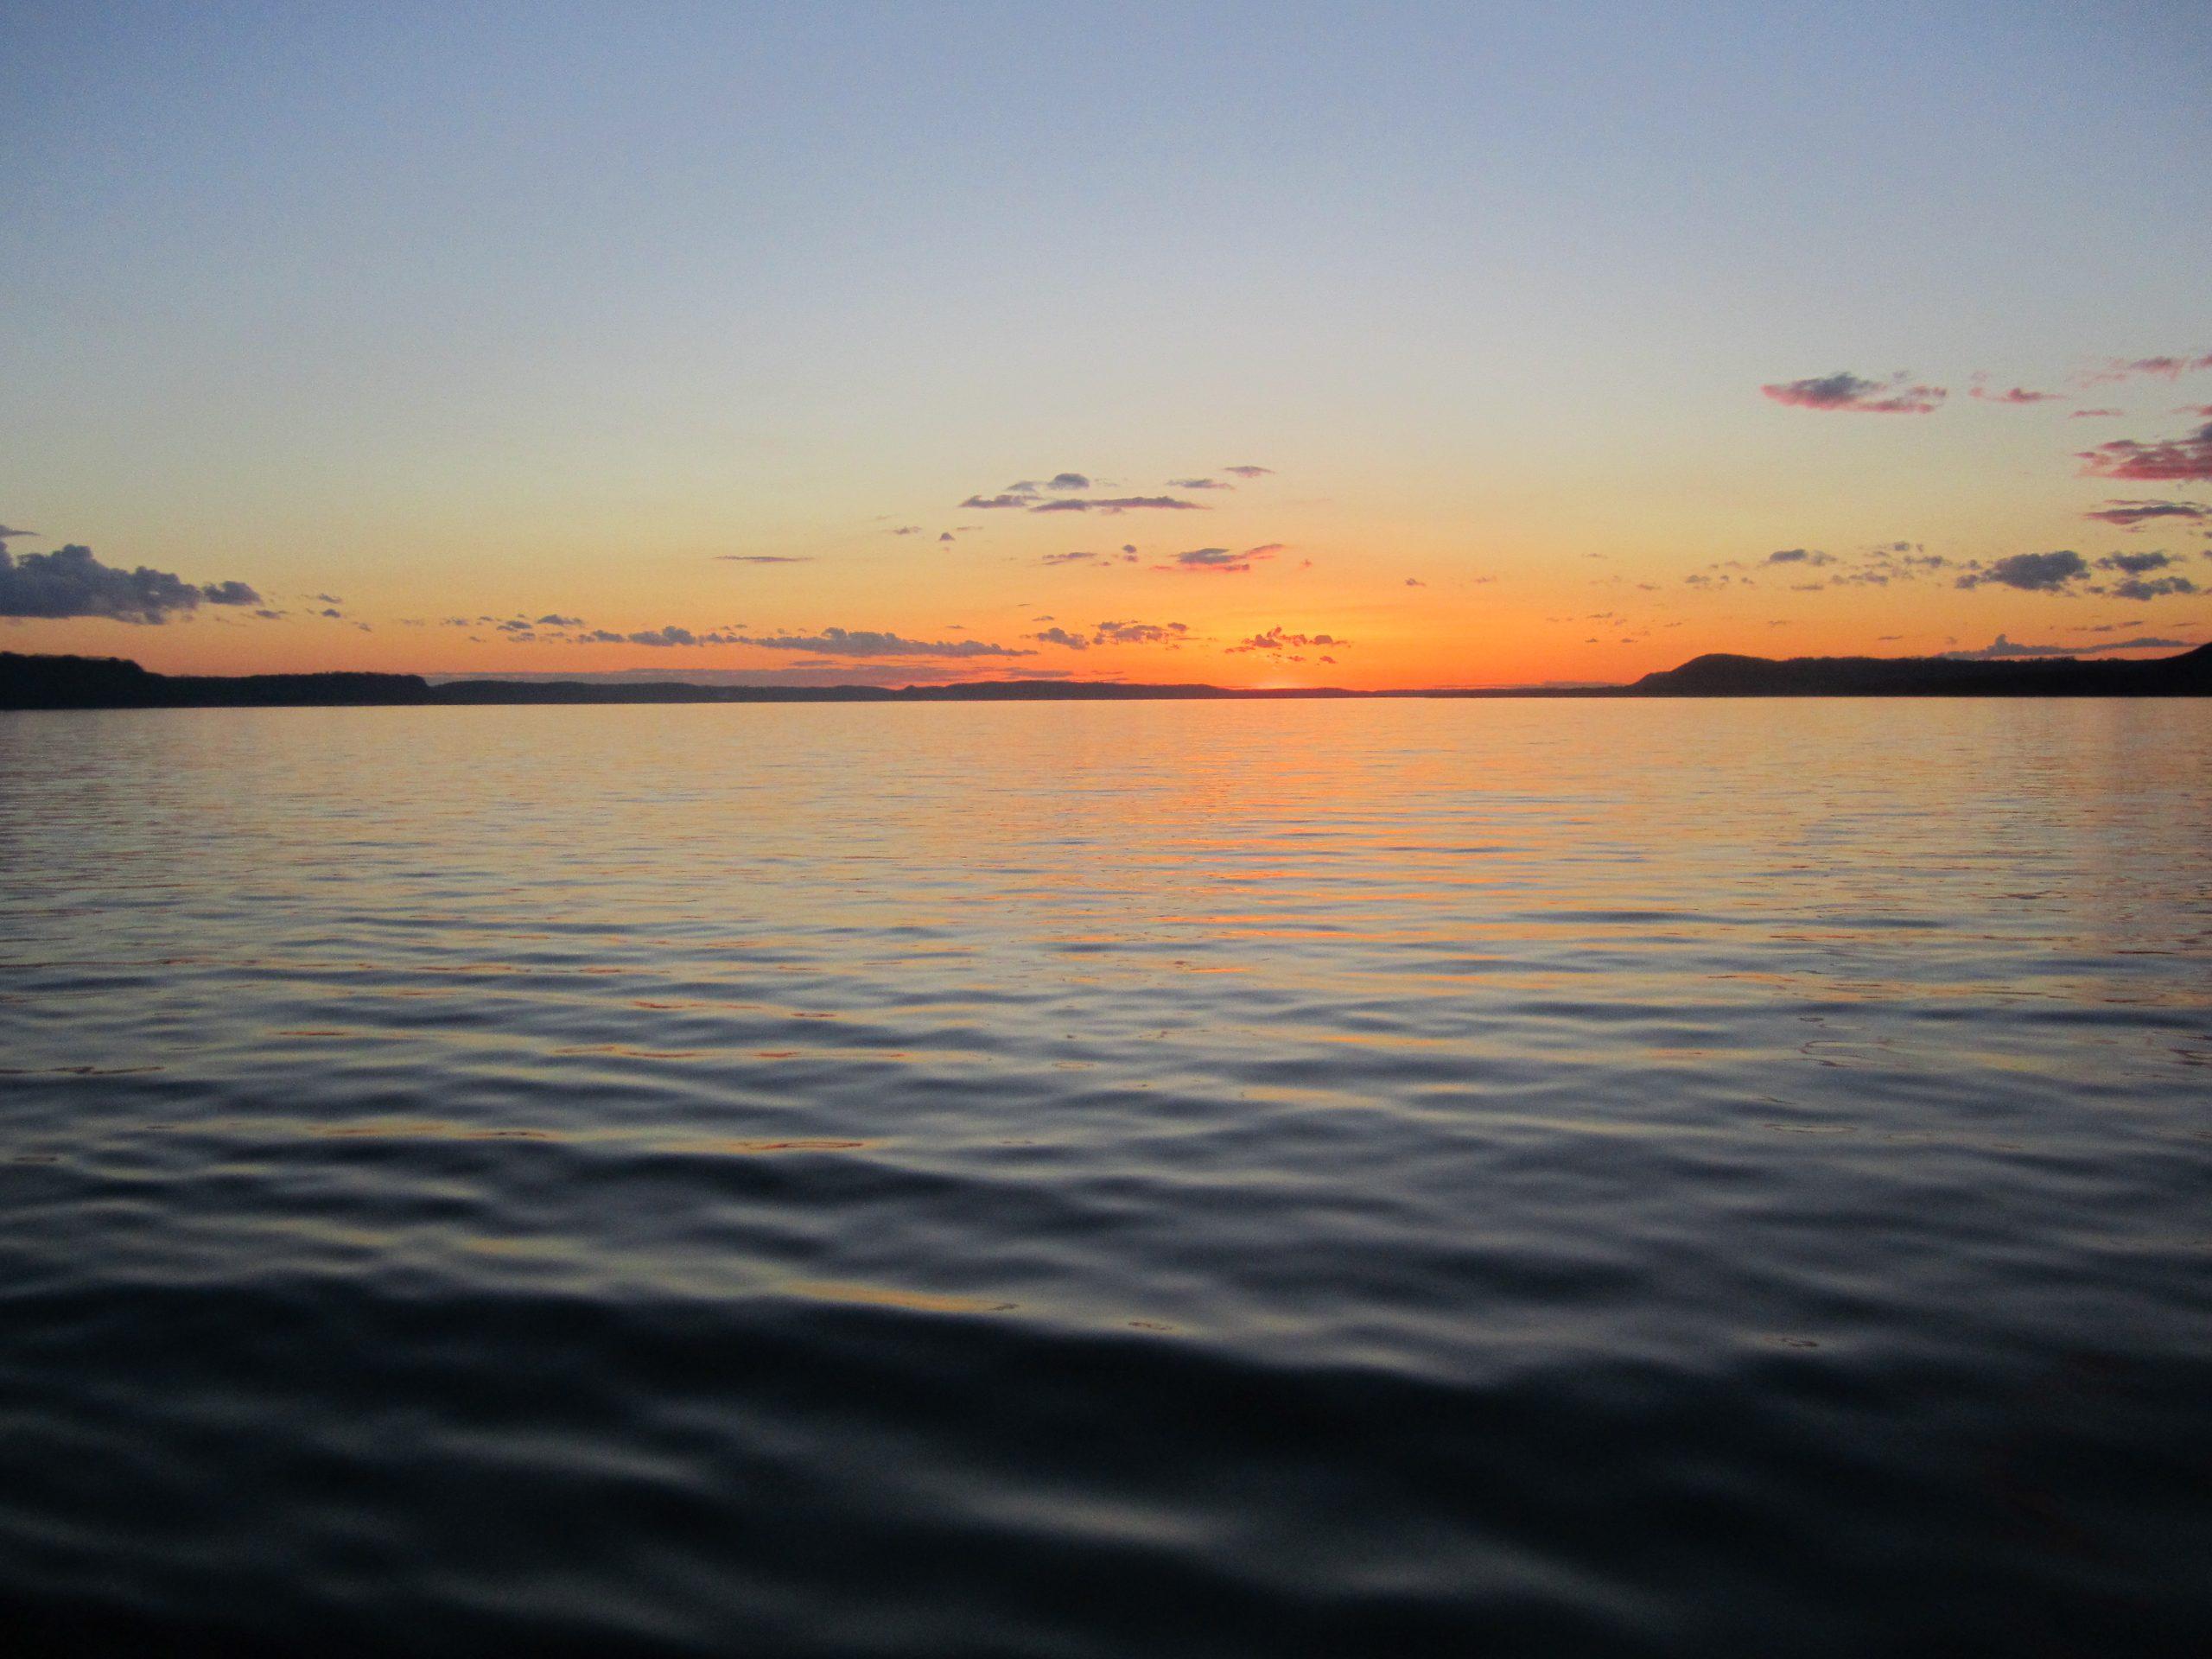 Lake Pepin